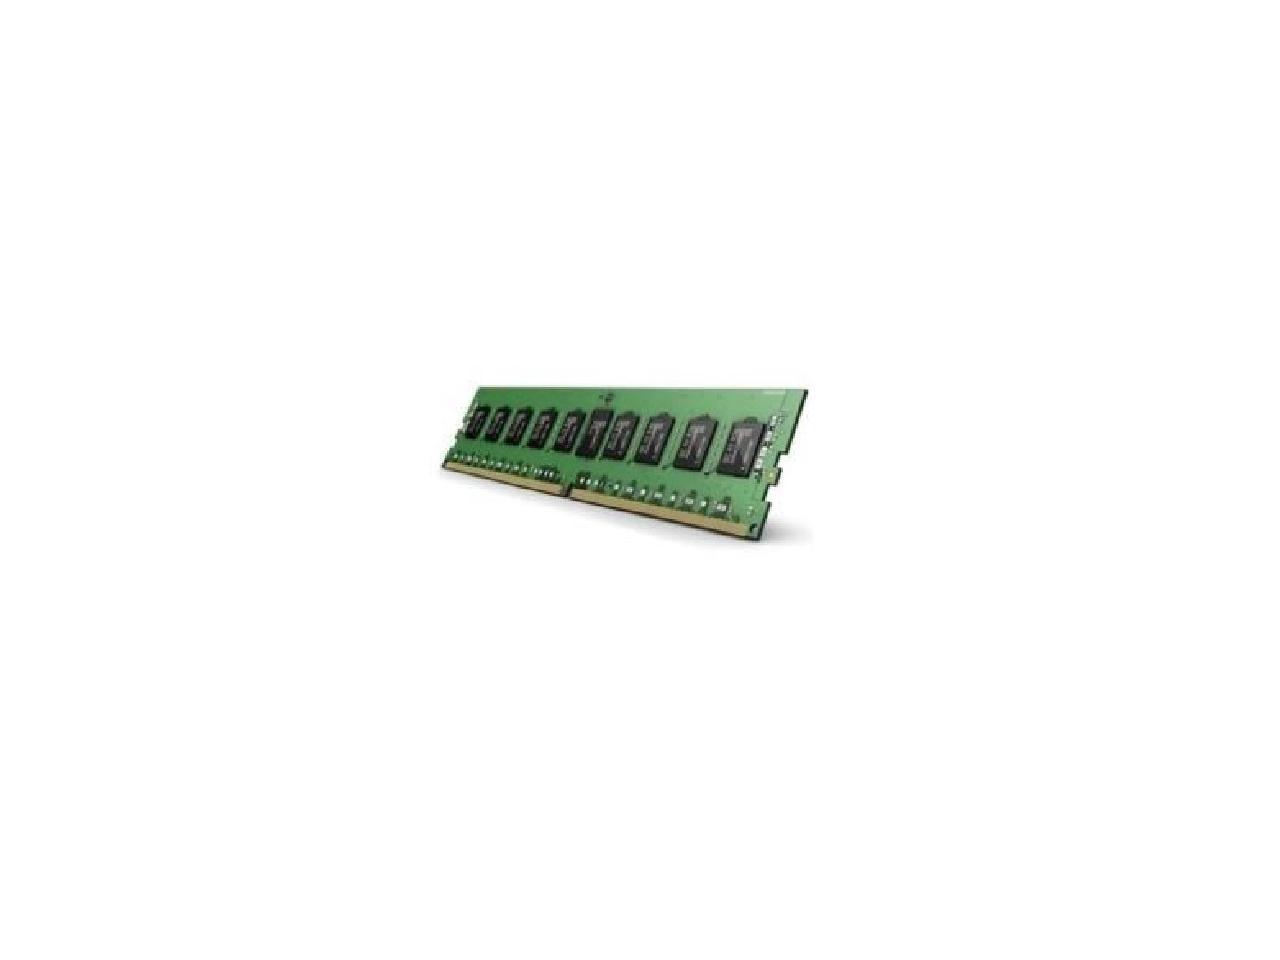 PARTS-QUICK BRAND Super X10DSC+ 16GB Memory for Supermicro SuperStorage Server 2028R-E1CR48L DDR4 PC4-2400 Registered DIMM